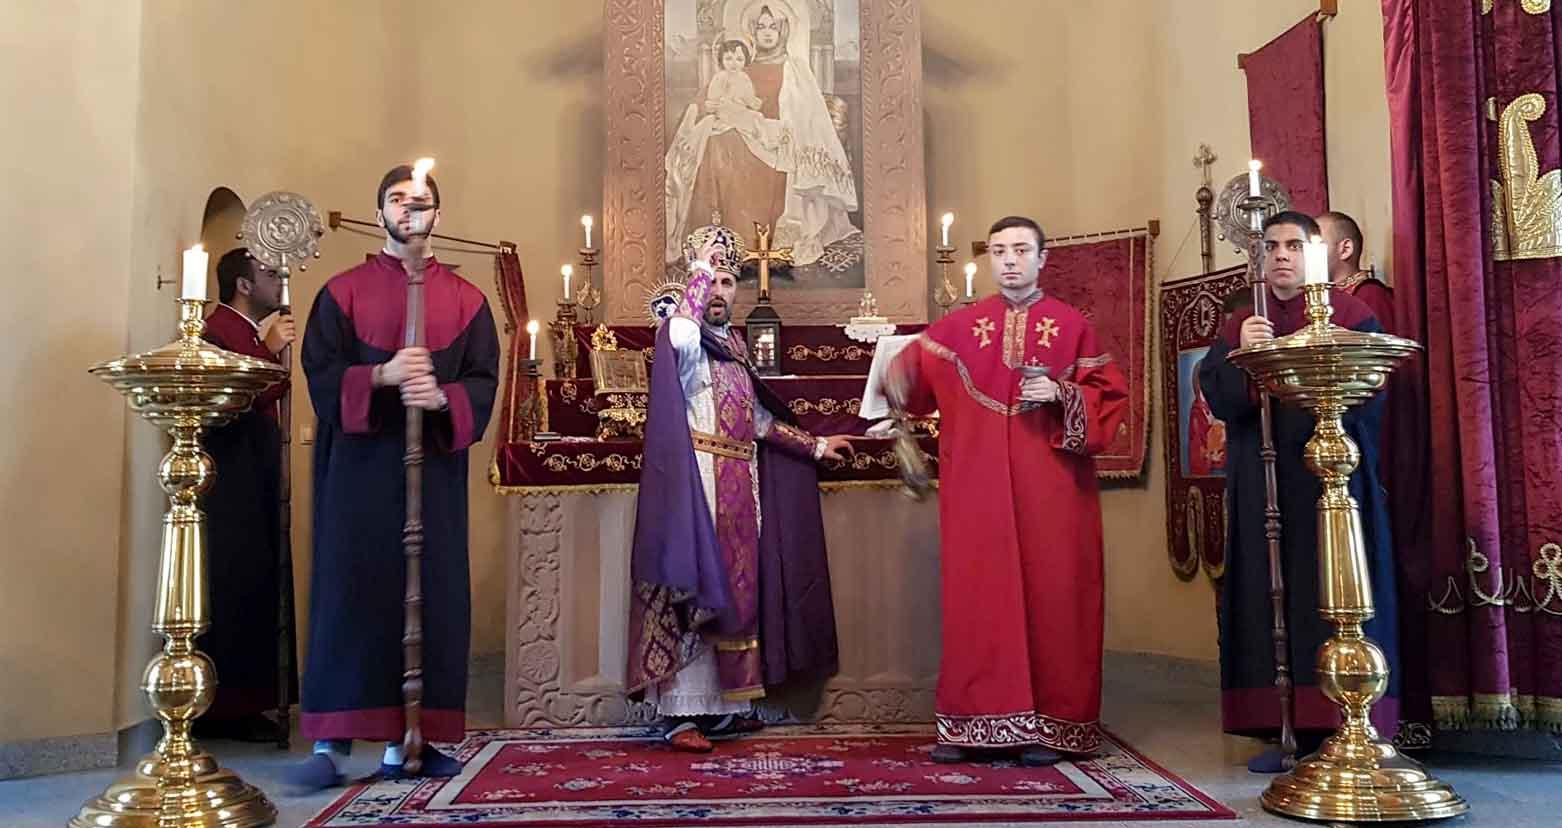 В Тбилиси отметили праздник Катохике Св. Эчмиадзина